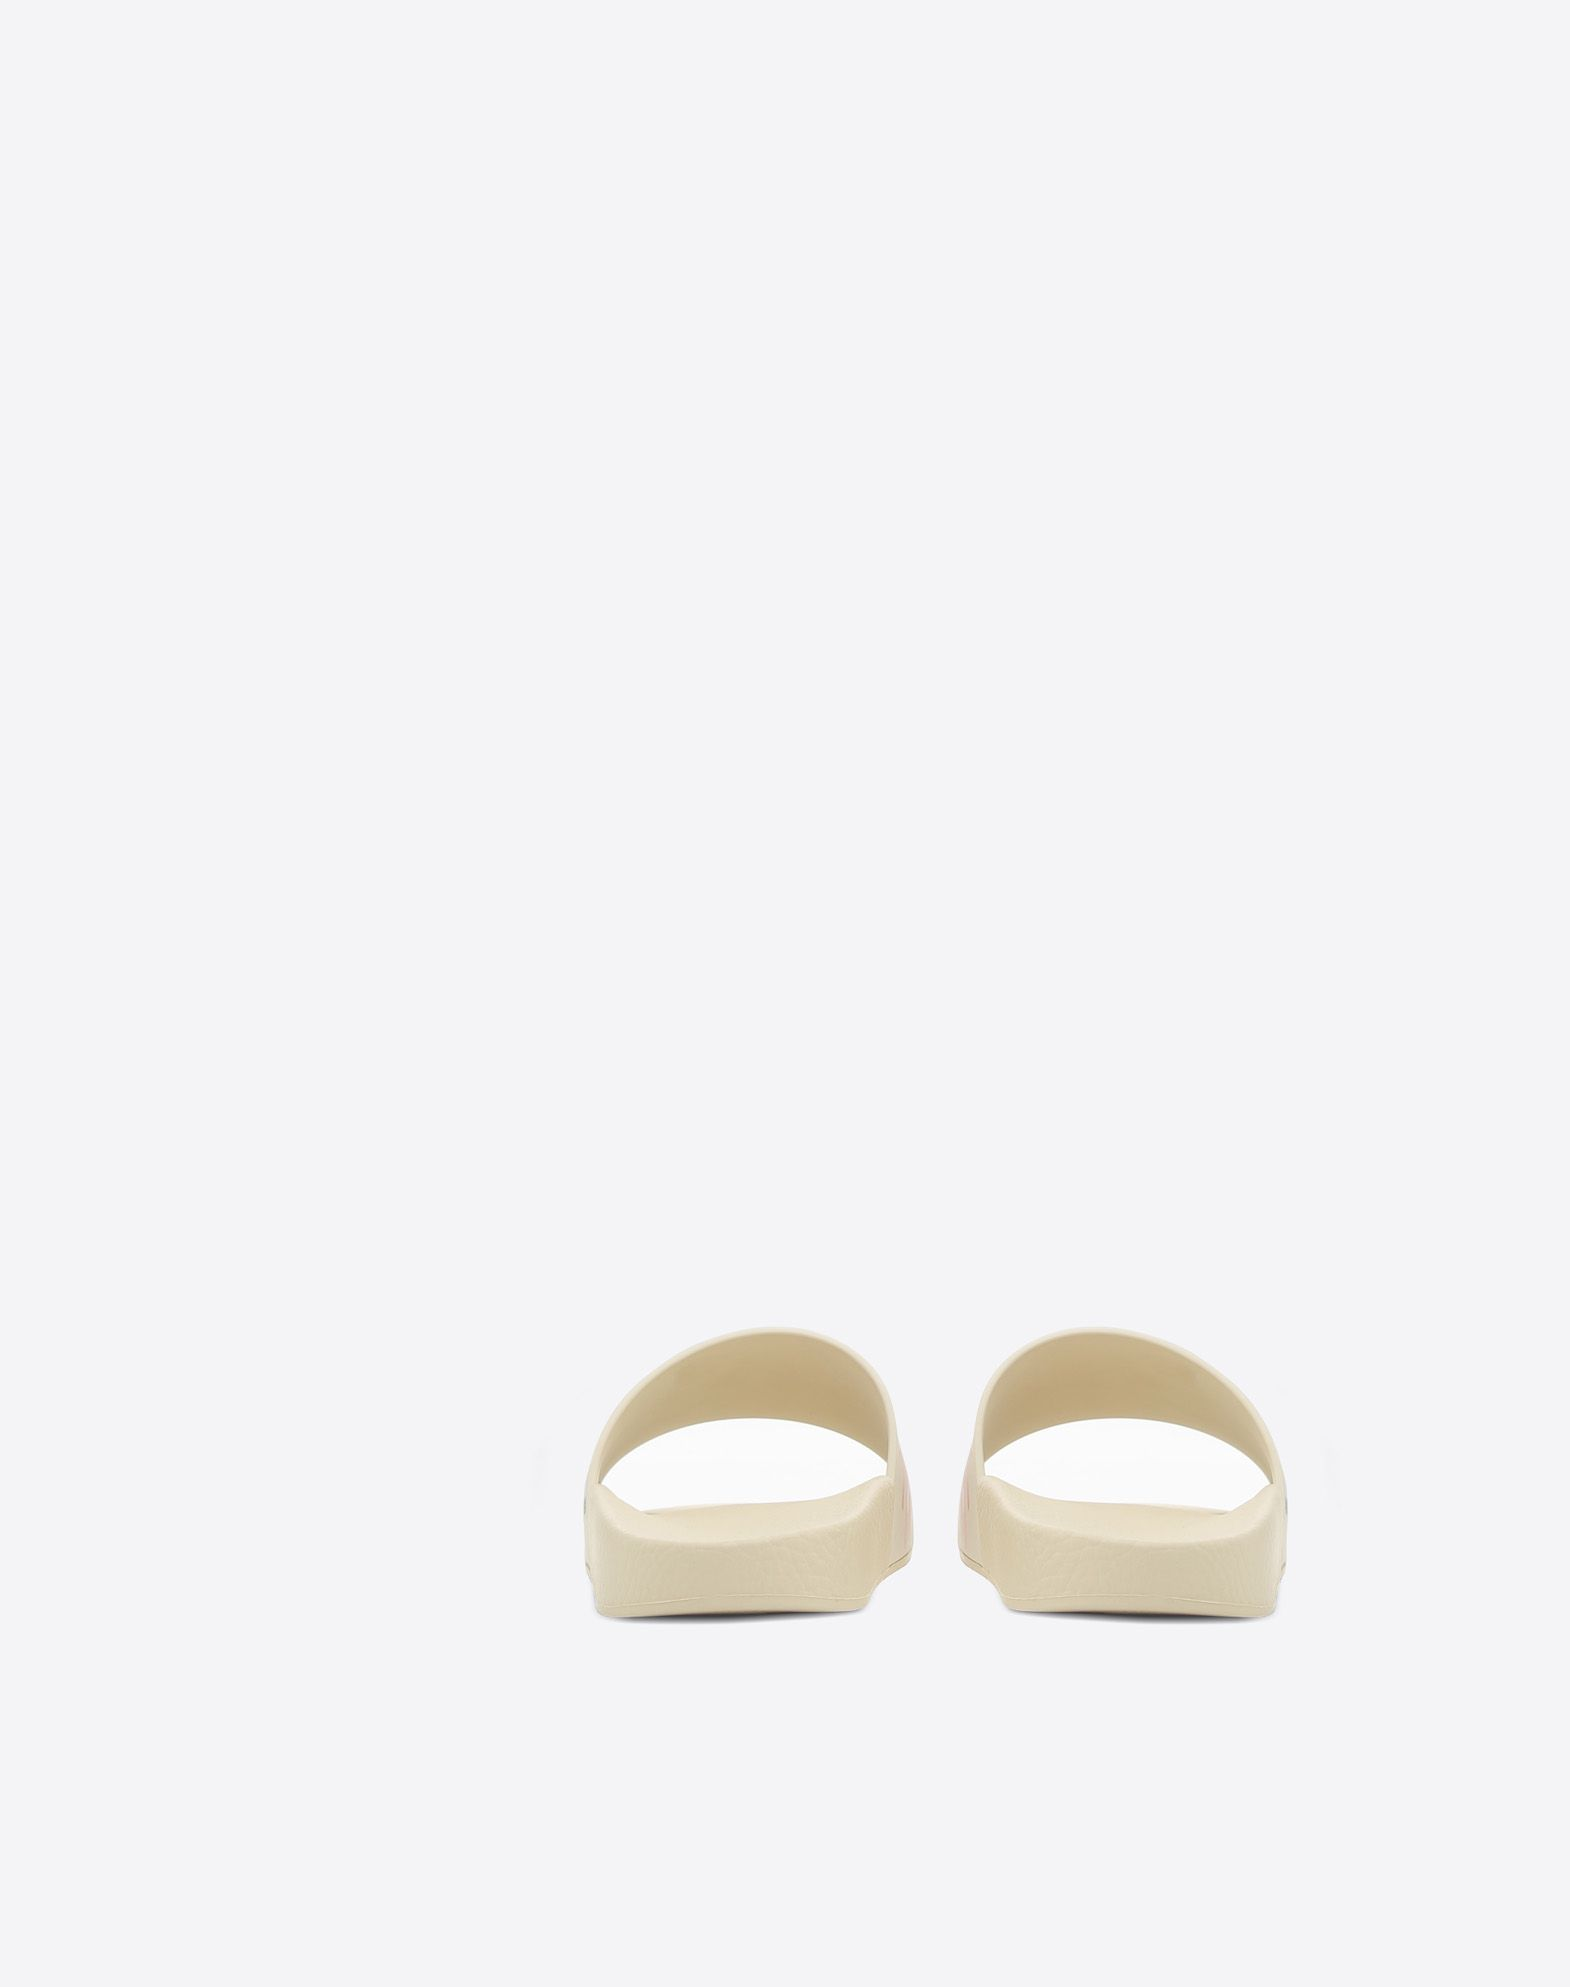 VALENTINO GARAVANI 口红印纹 PVC 拖鞋式凉鞋 拖鞋式凉鞋 D d